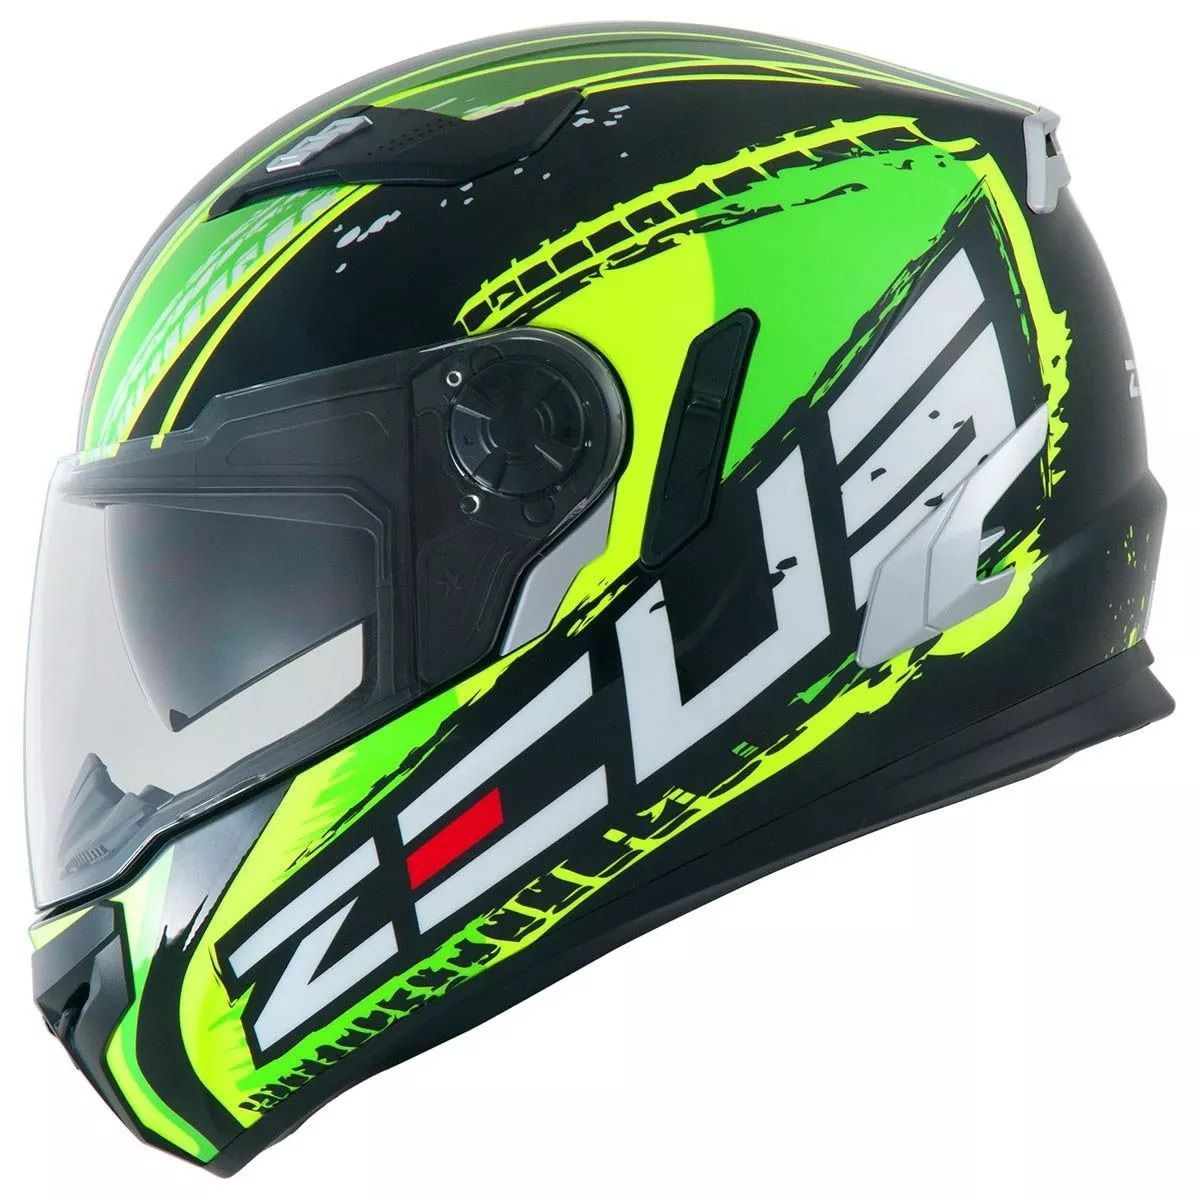 Capacete Zeus 813 An13 Brasil Verde  - Ditesta & Daihead - Moto Store